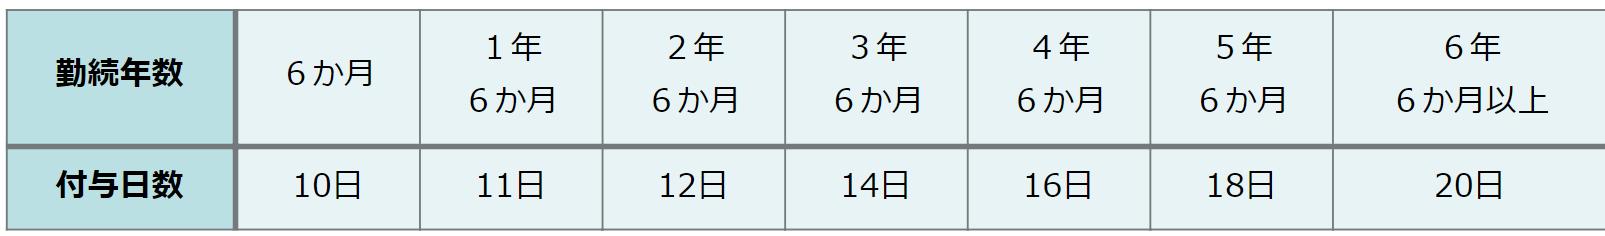 2018-11-30-1